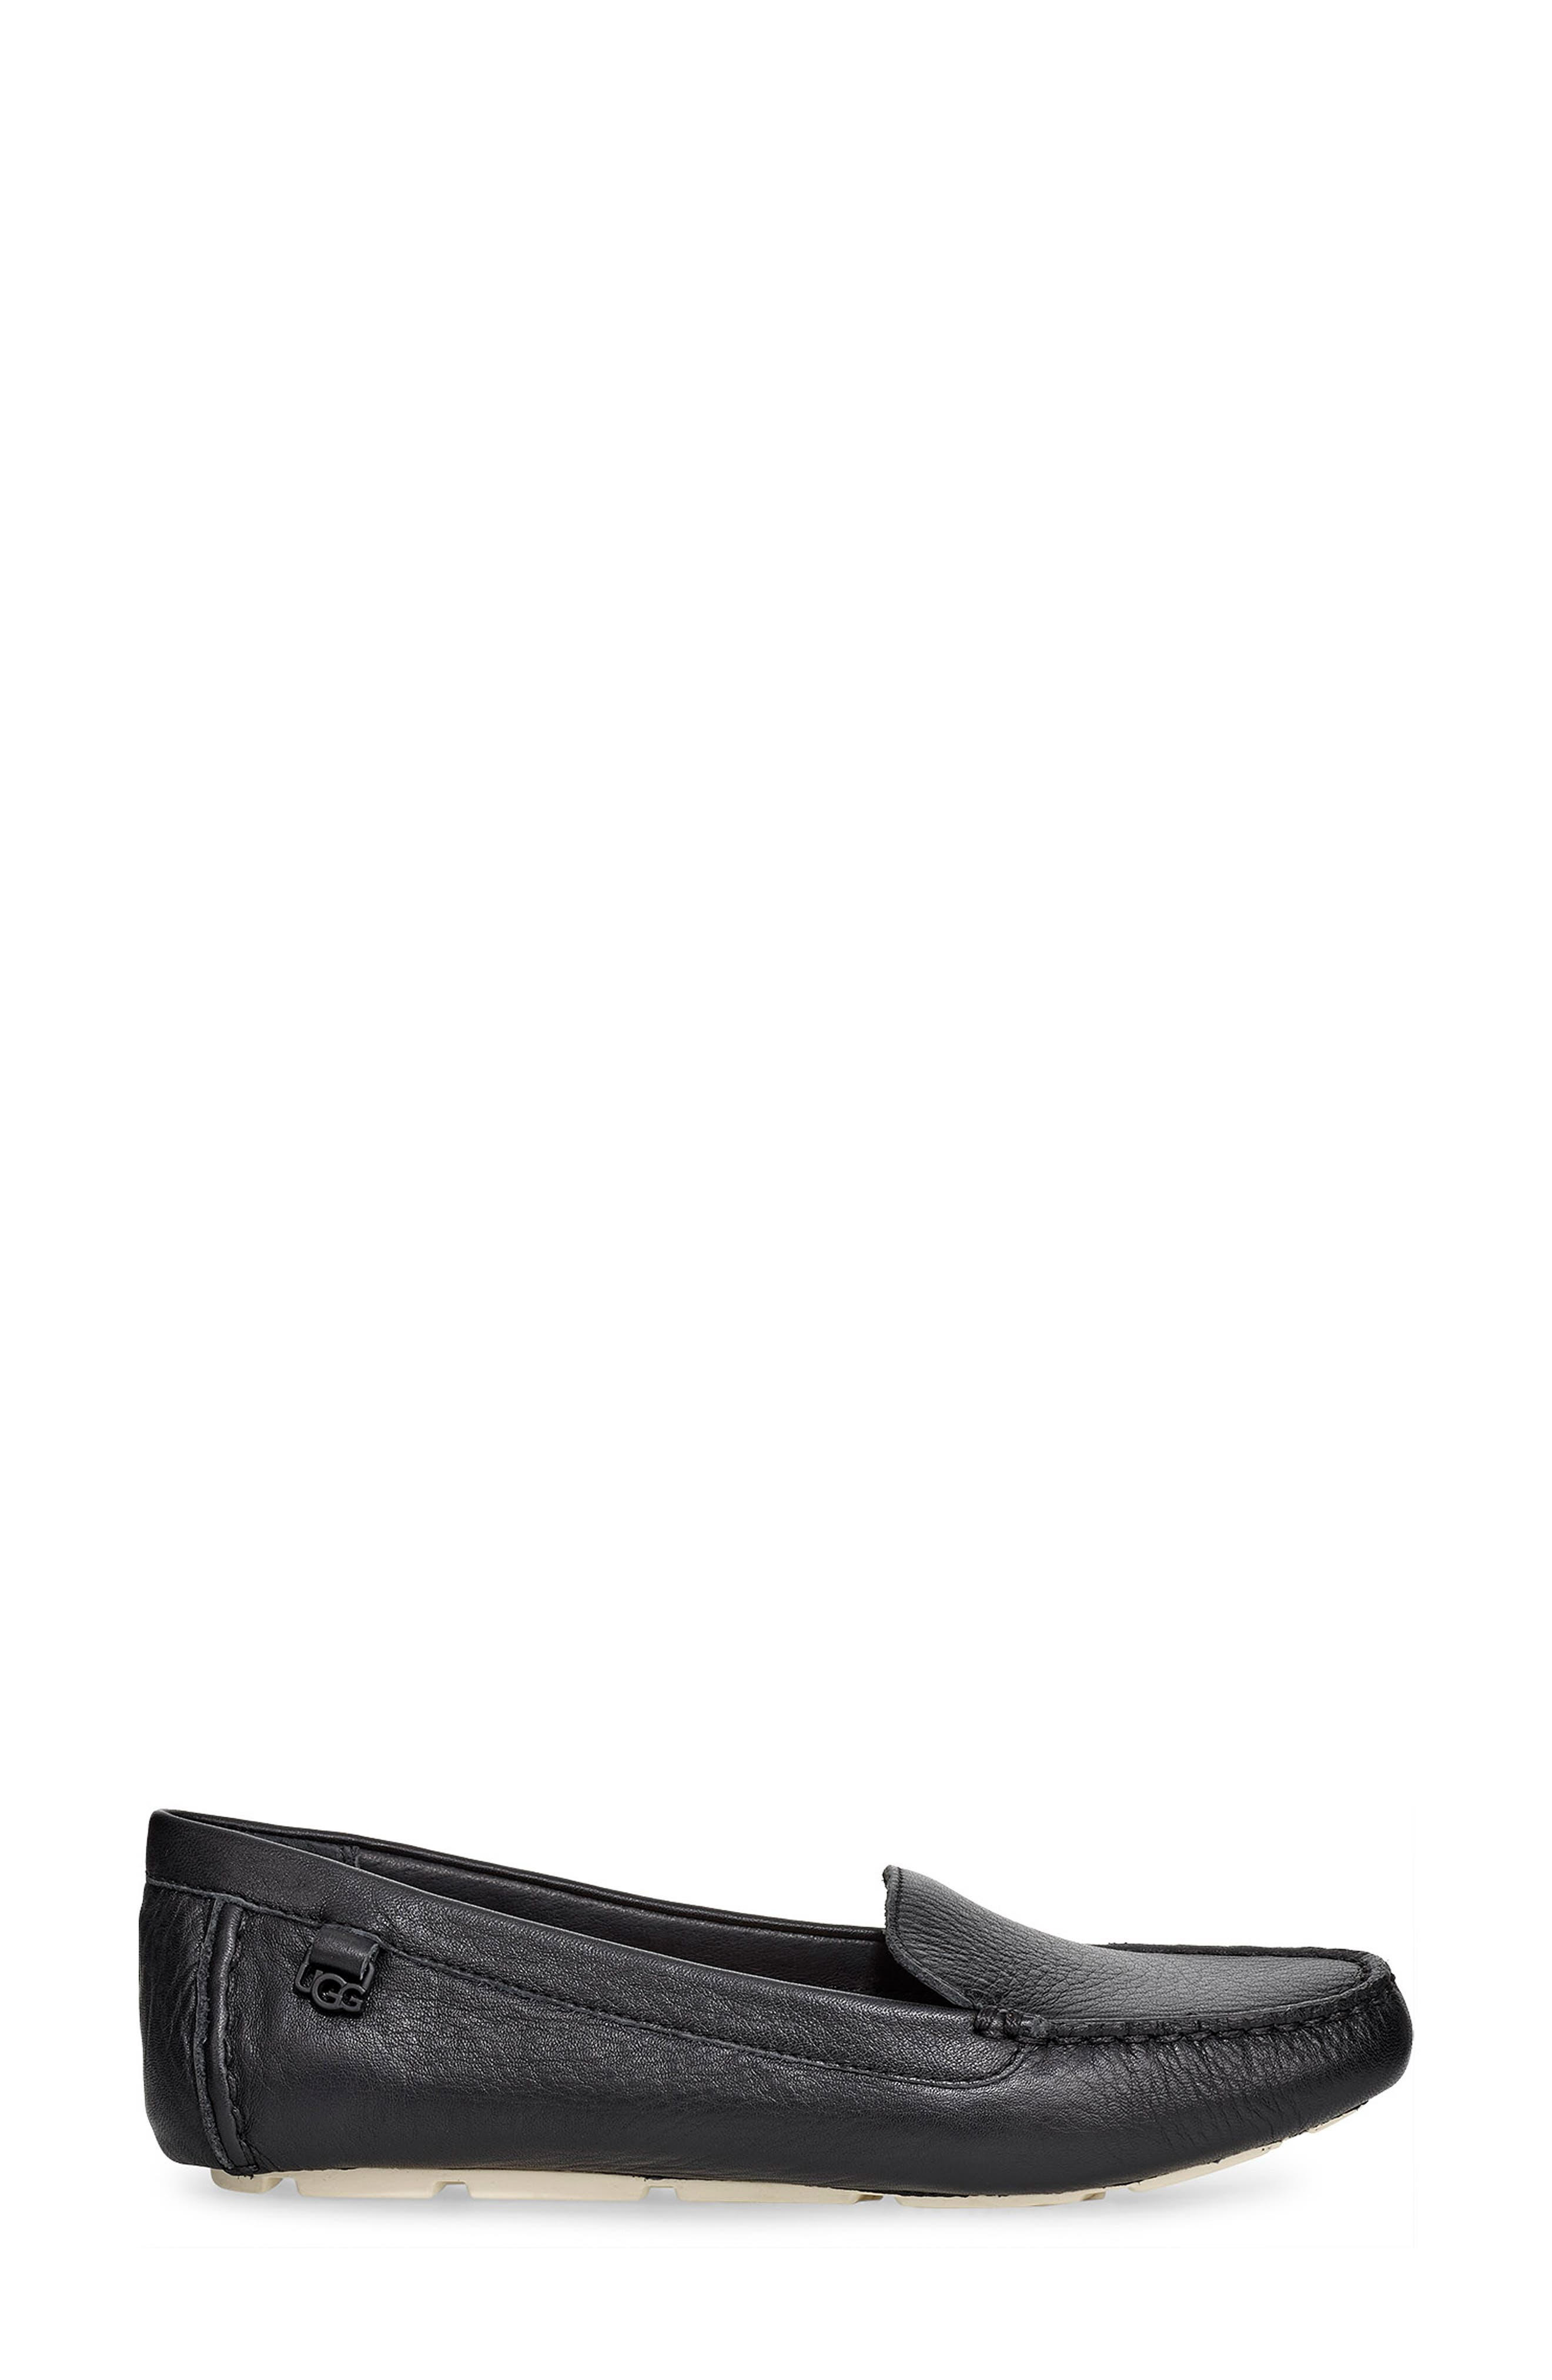 Flores Driving Loafer,                             Alternate thumbnail 3, color,                             BLACK LEATHER